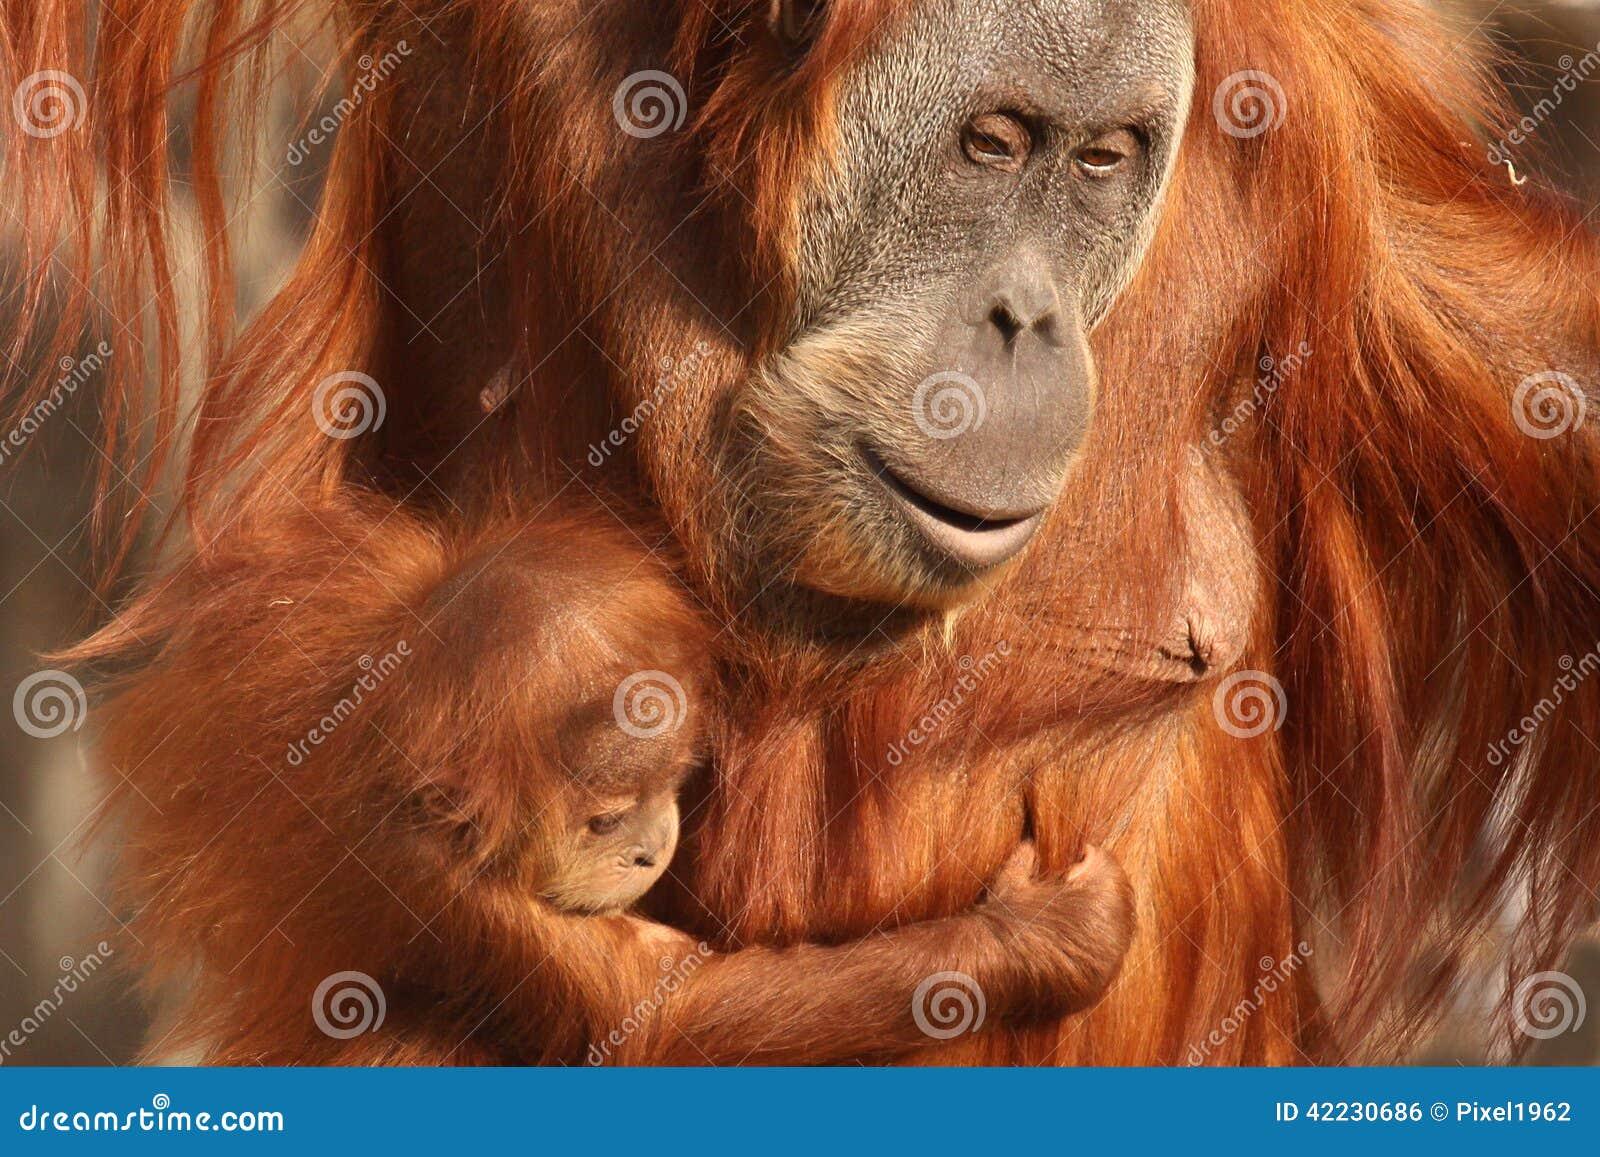 Mother orangutan with her cute baby